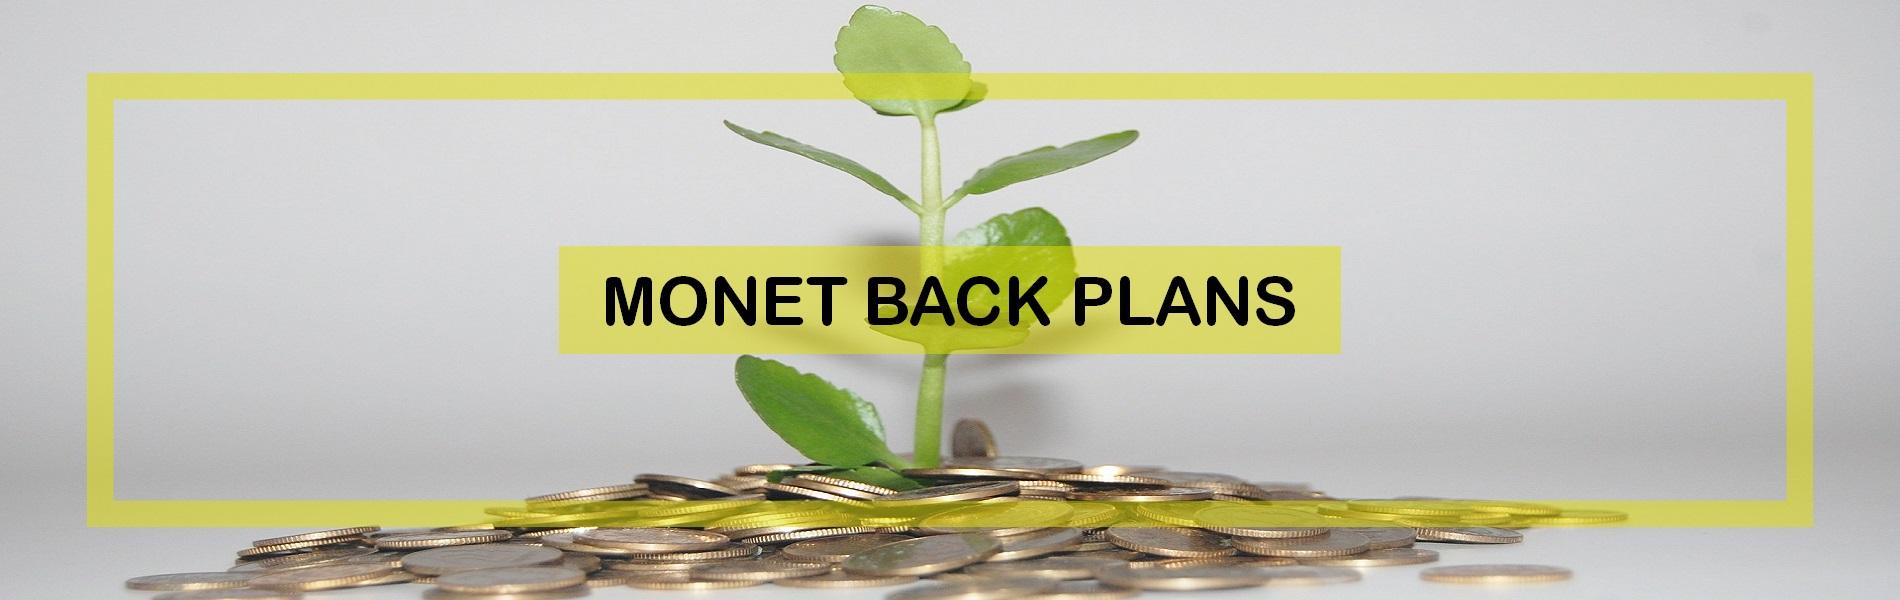 Money Back Plans